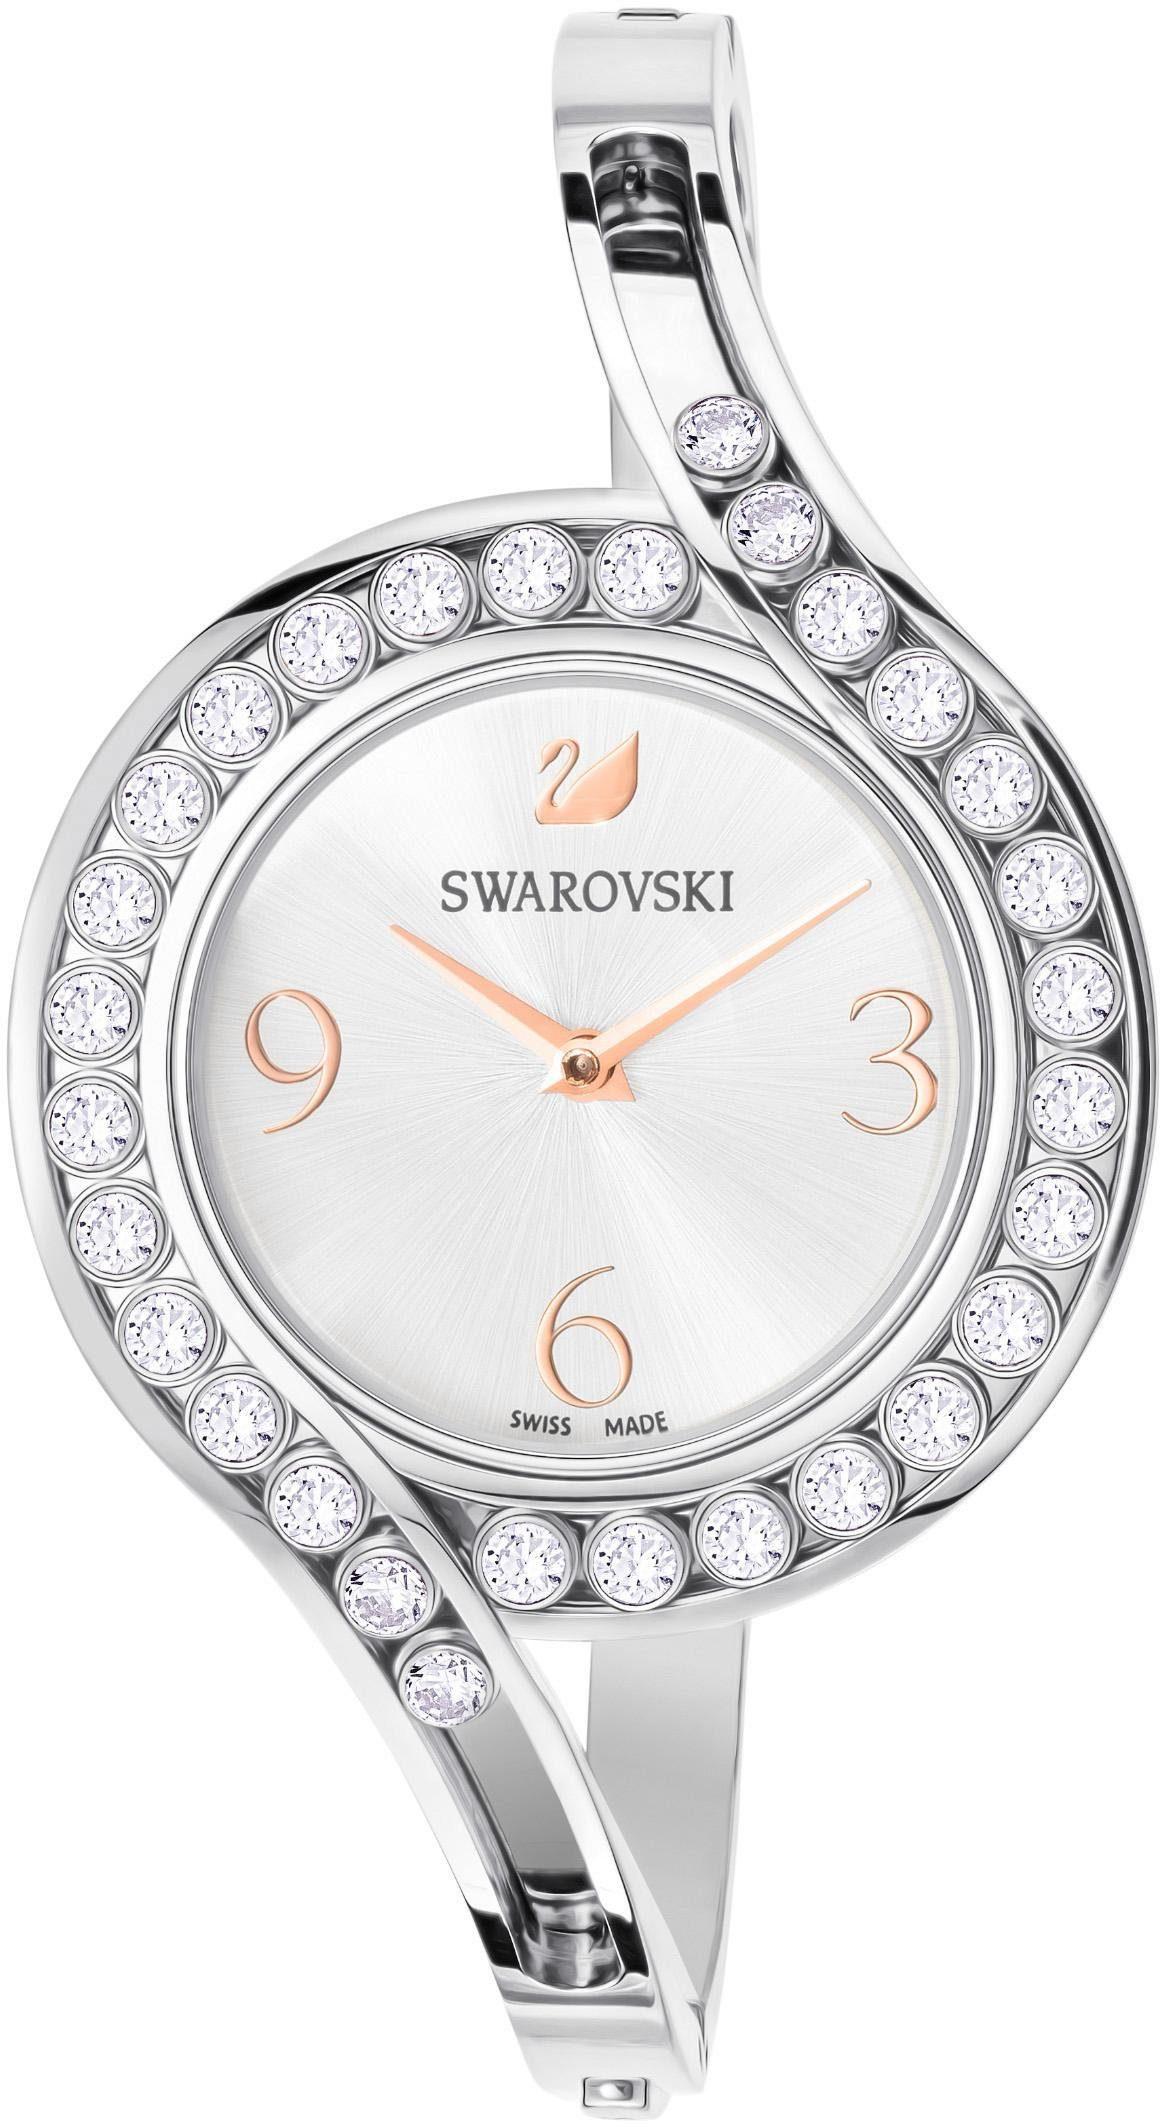 Swarovski Swarovski »lovely Schweizer Schweizer Crystals5452492«Otto Swarovski Uhr »lovely Uhr Uhr Crystals5452492«Otto Schweizer »lovely 0Onk8wP